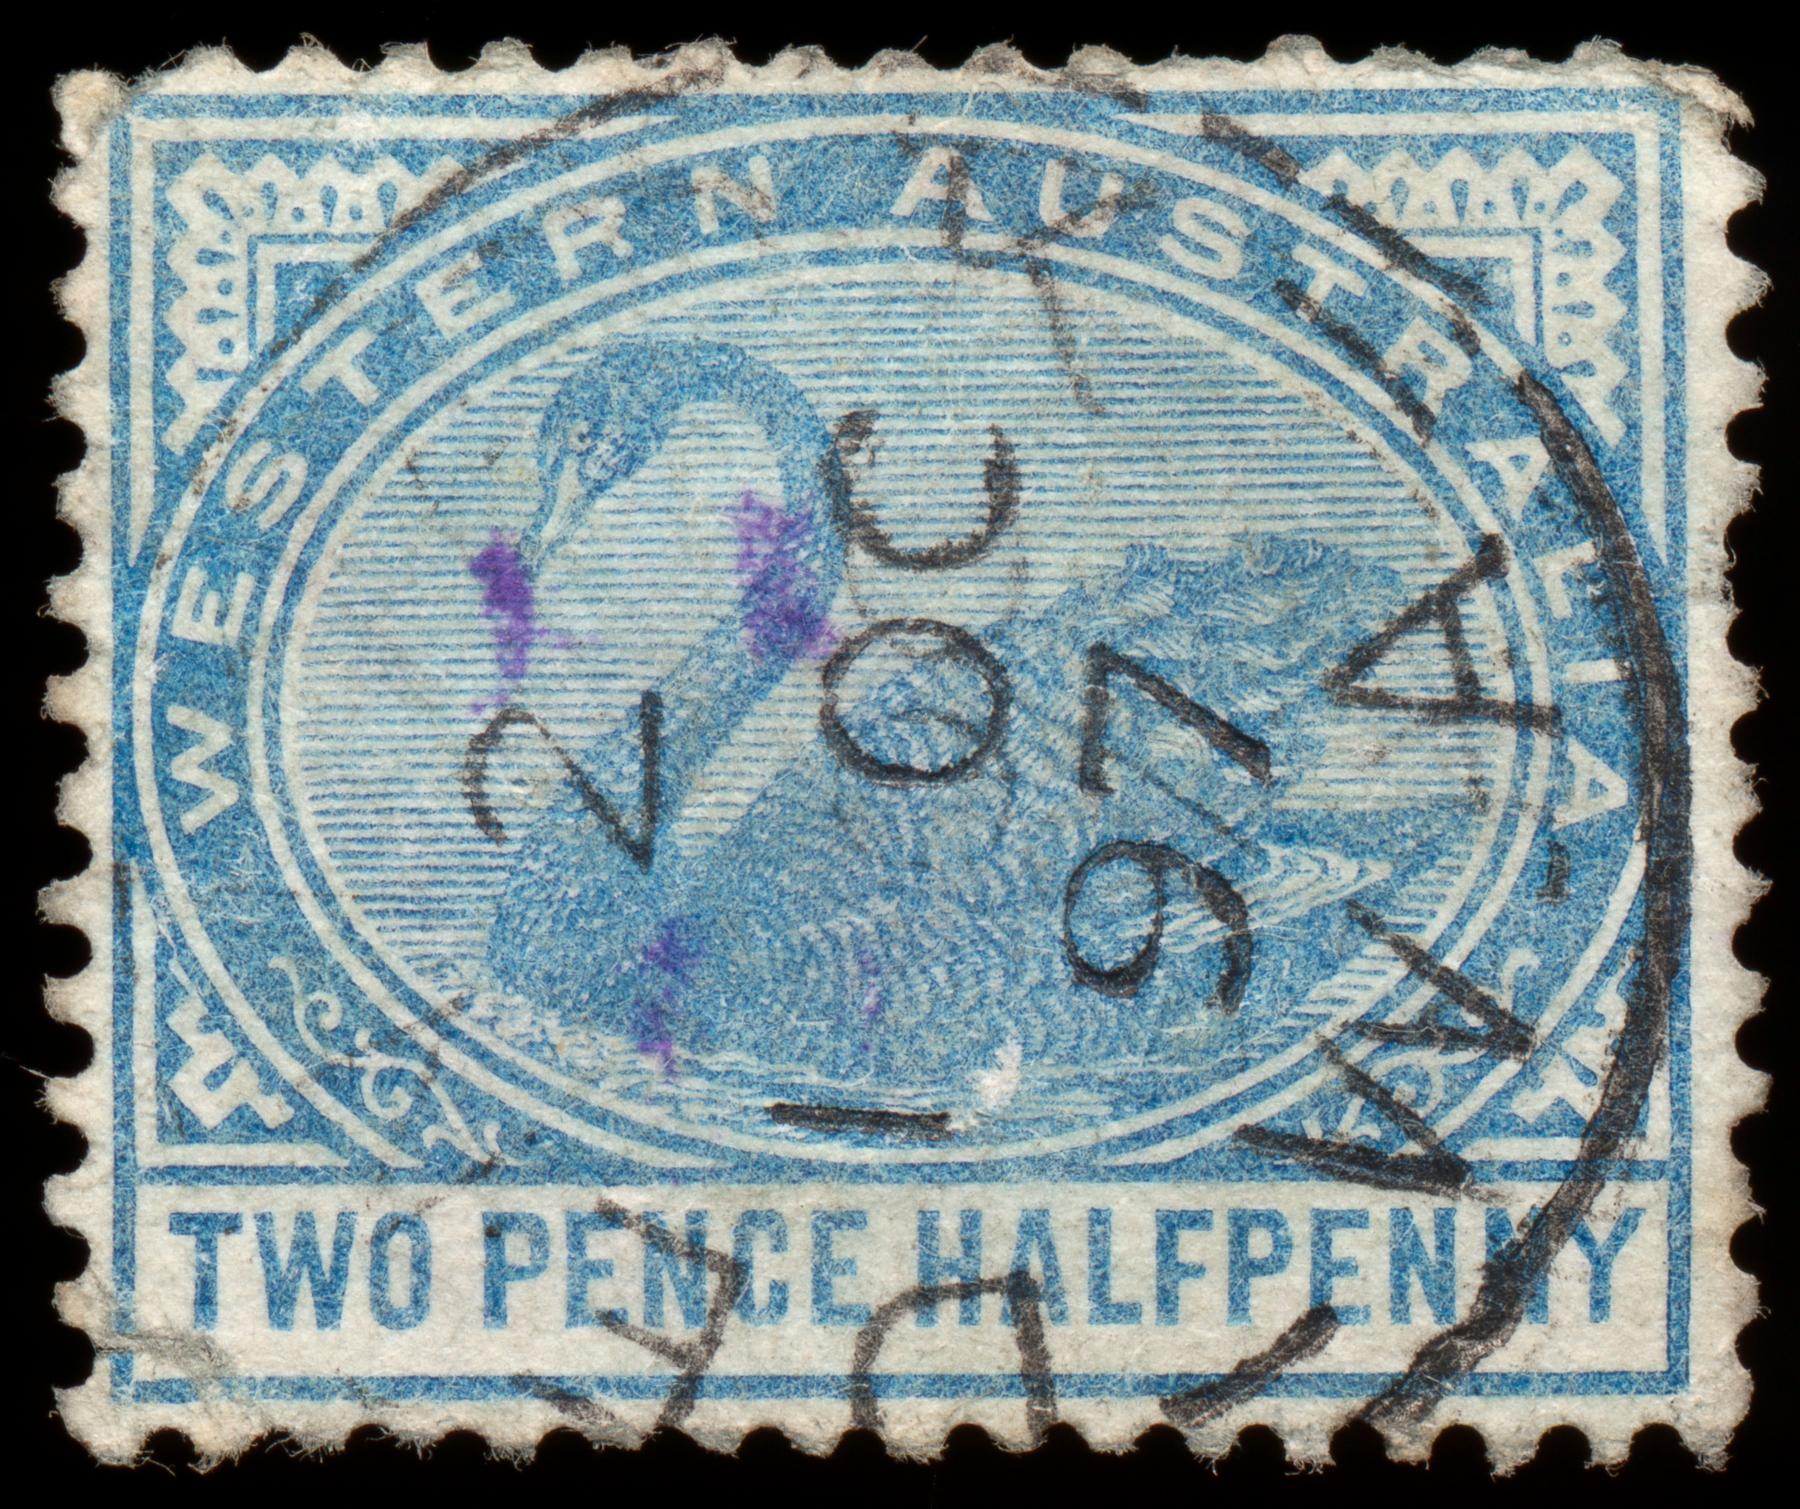 Cyan swan stamp photo